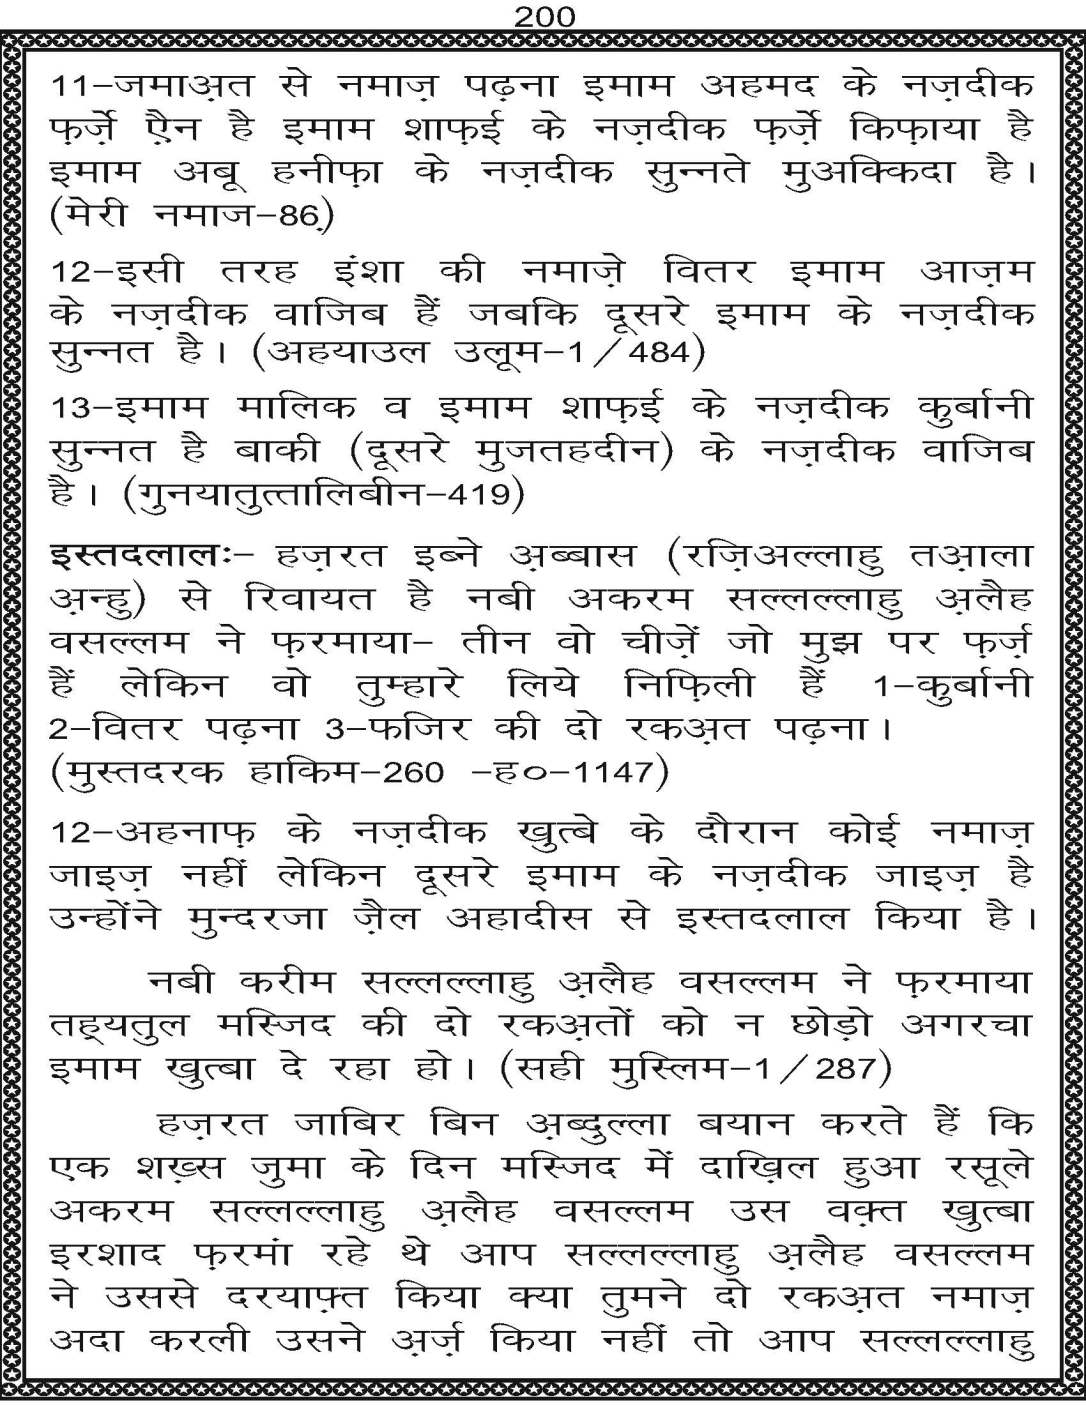 AzmateTaziyadari_Page_200